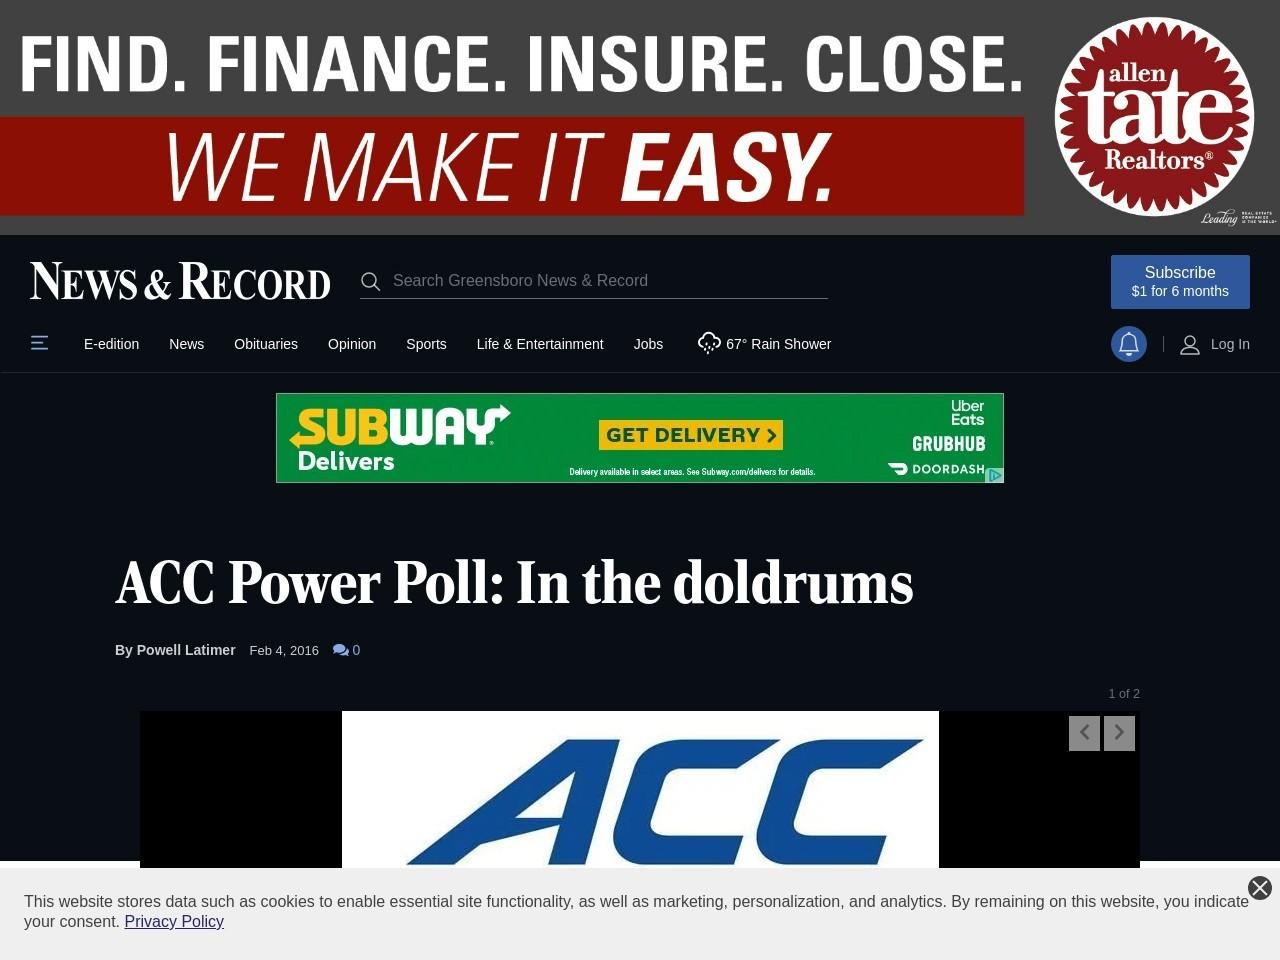 ACC Power Poll: ACC Doldrums